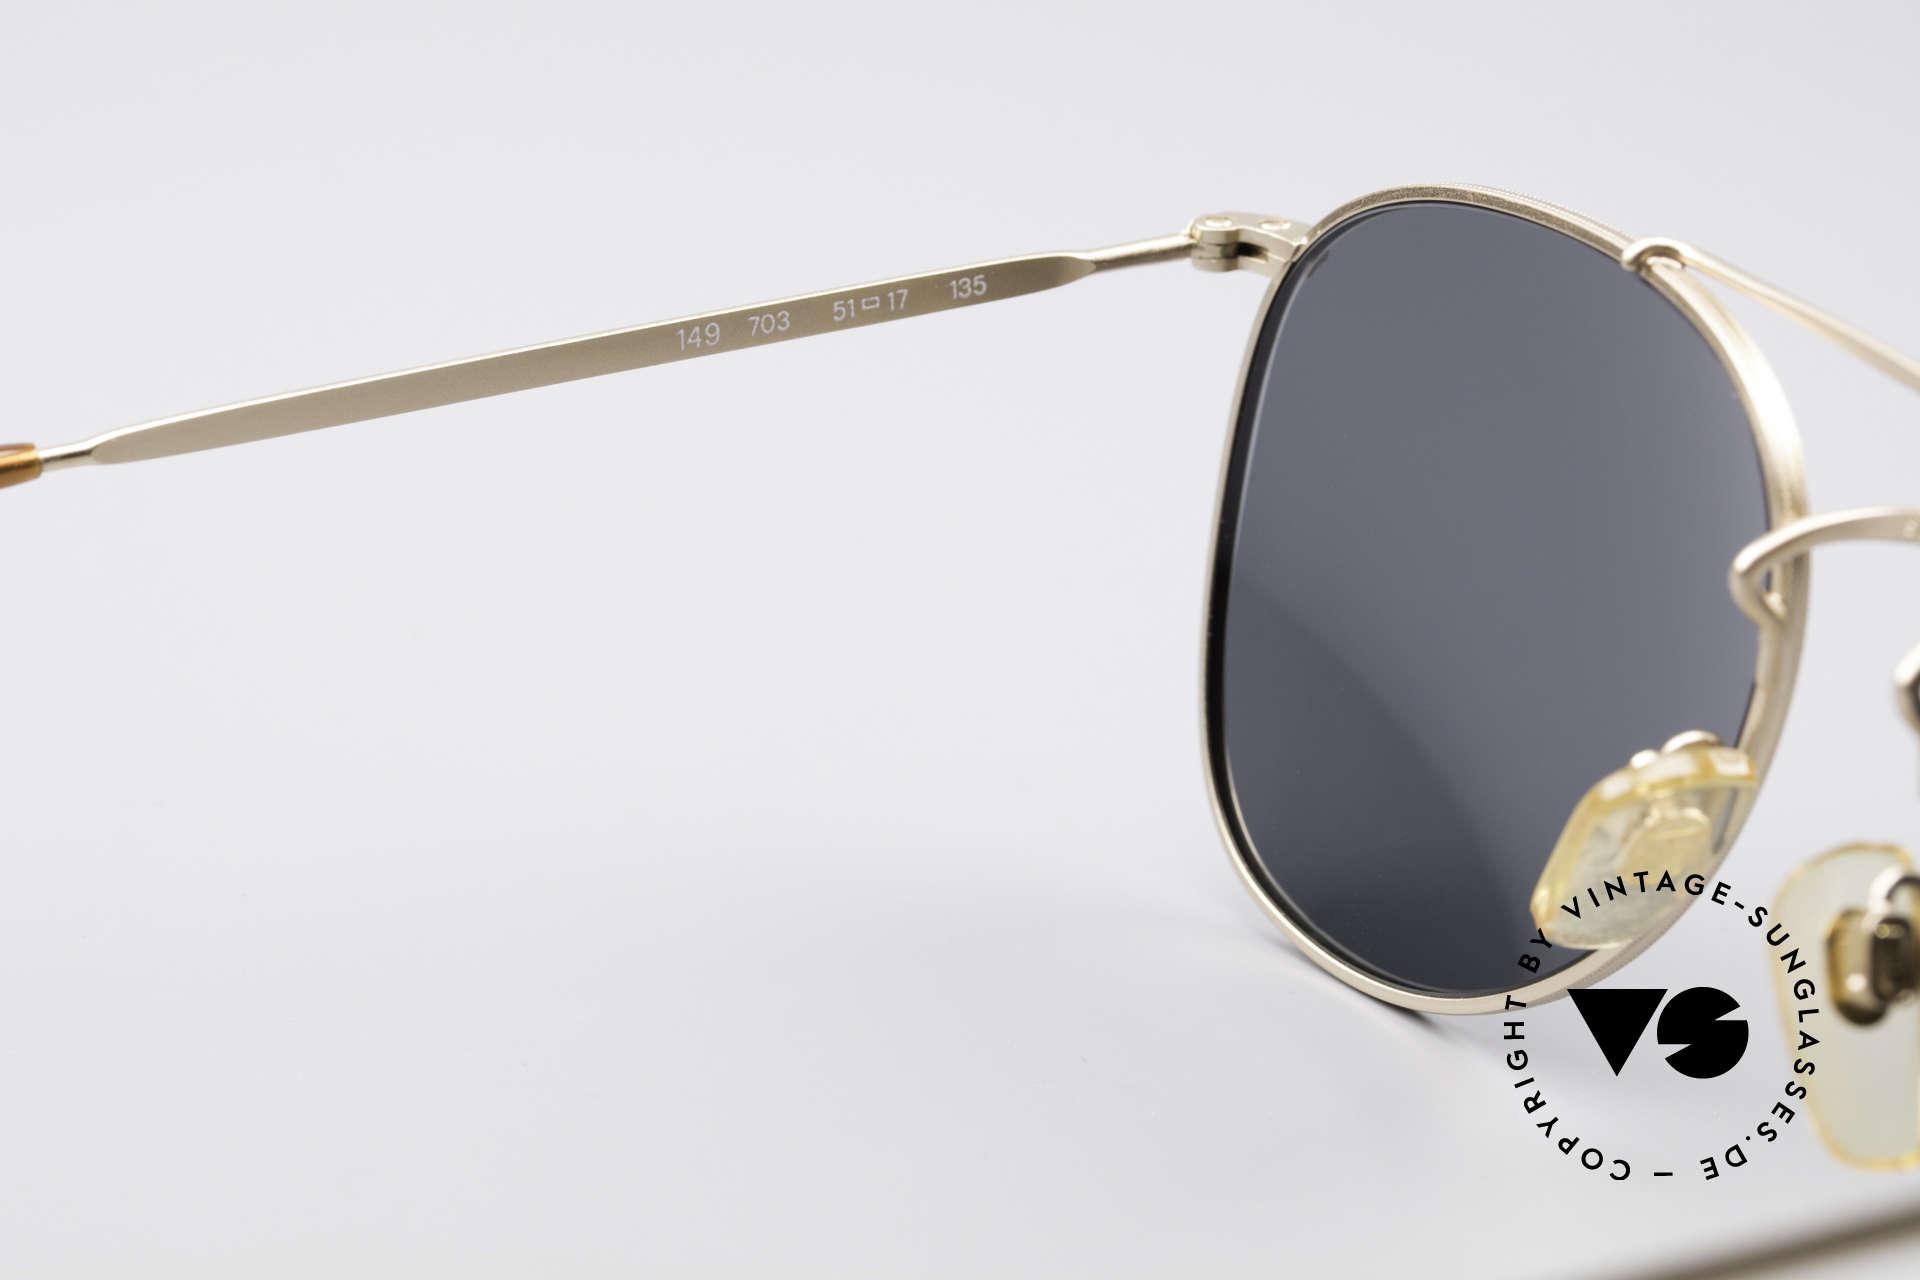 Giorgio Armani 149 Small 90'S Aviator Sunglasses, never worn (like all our 1990's designer classics), Made for Men and Women